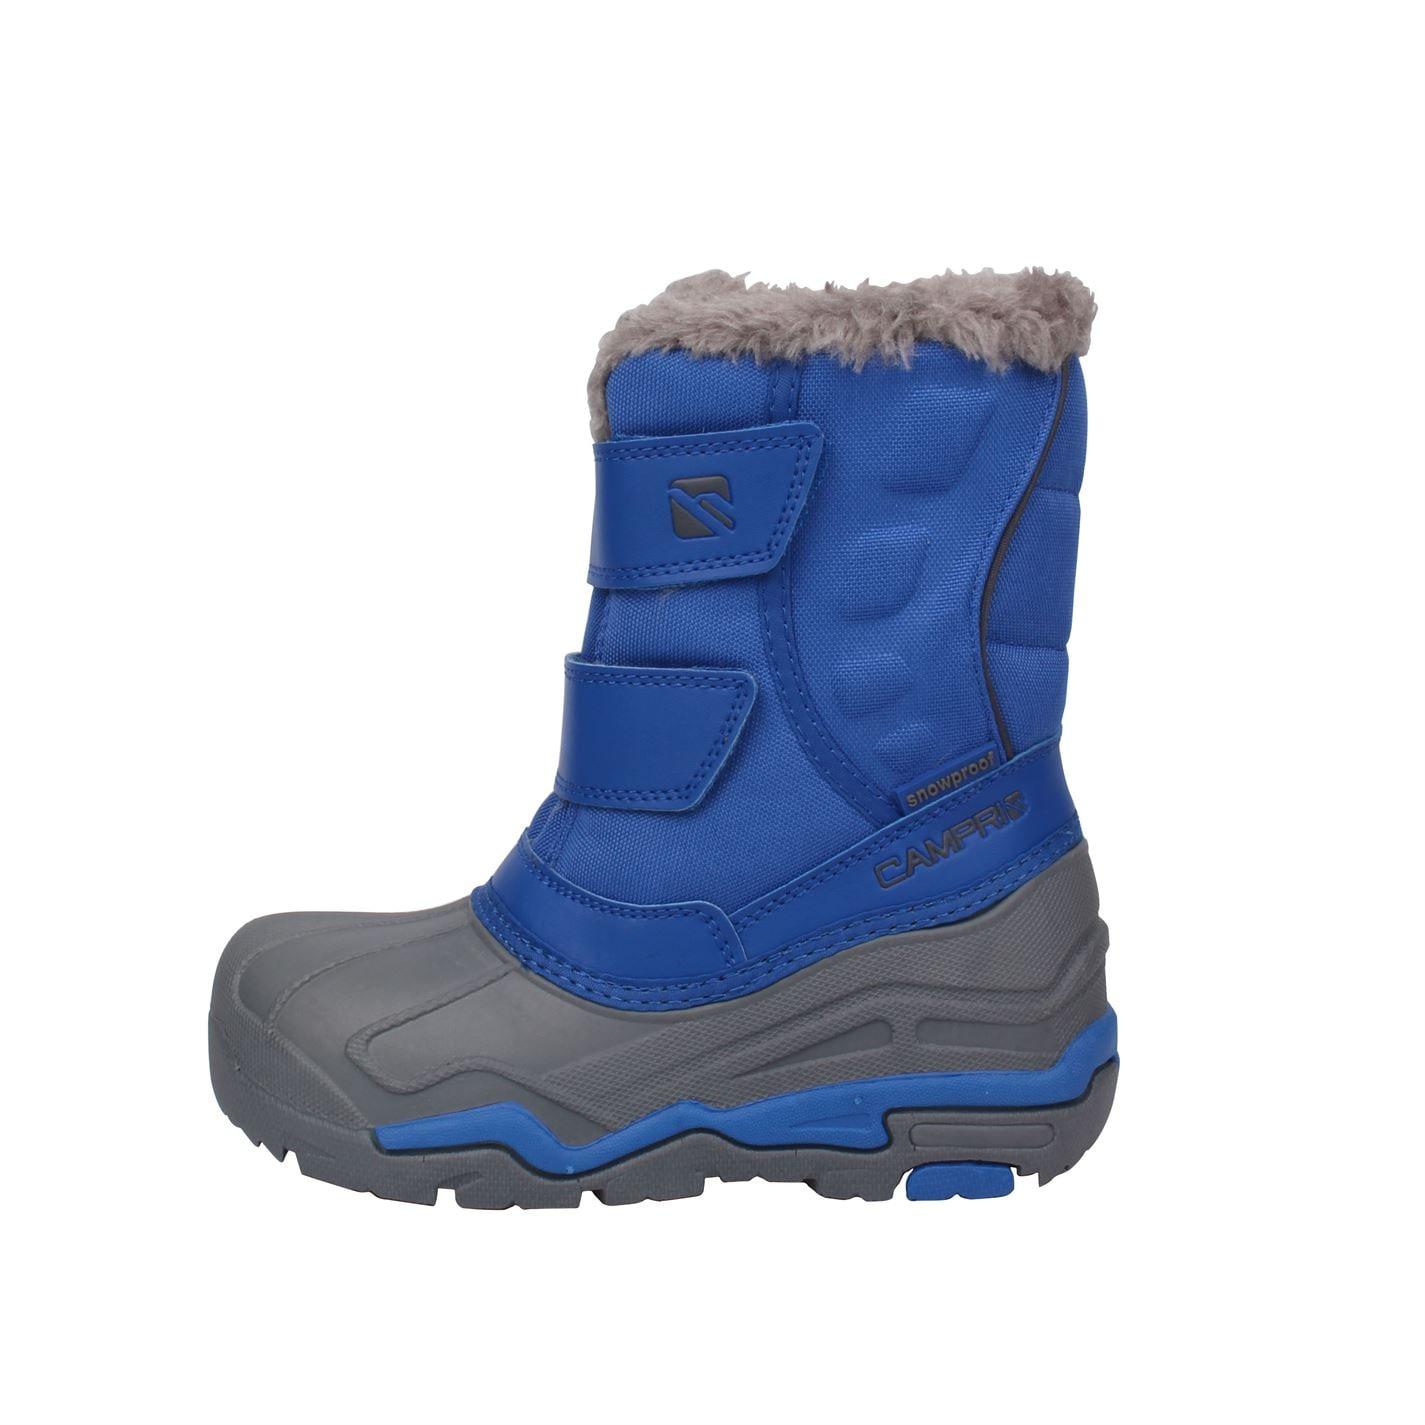 Campri Kids Childrens Snow Boots Shoes Winter Footwear Snowproof Fleece